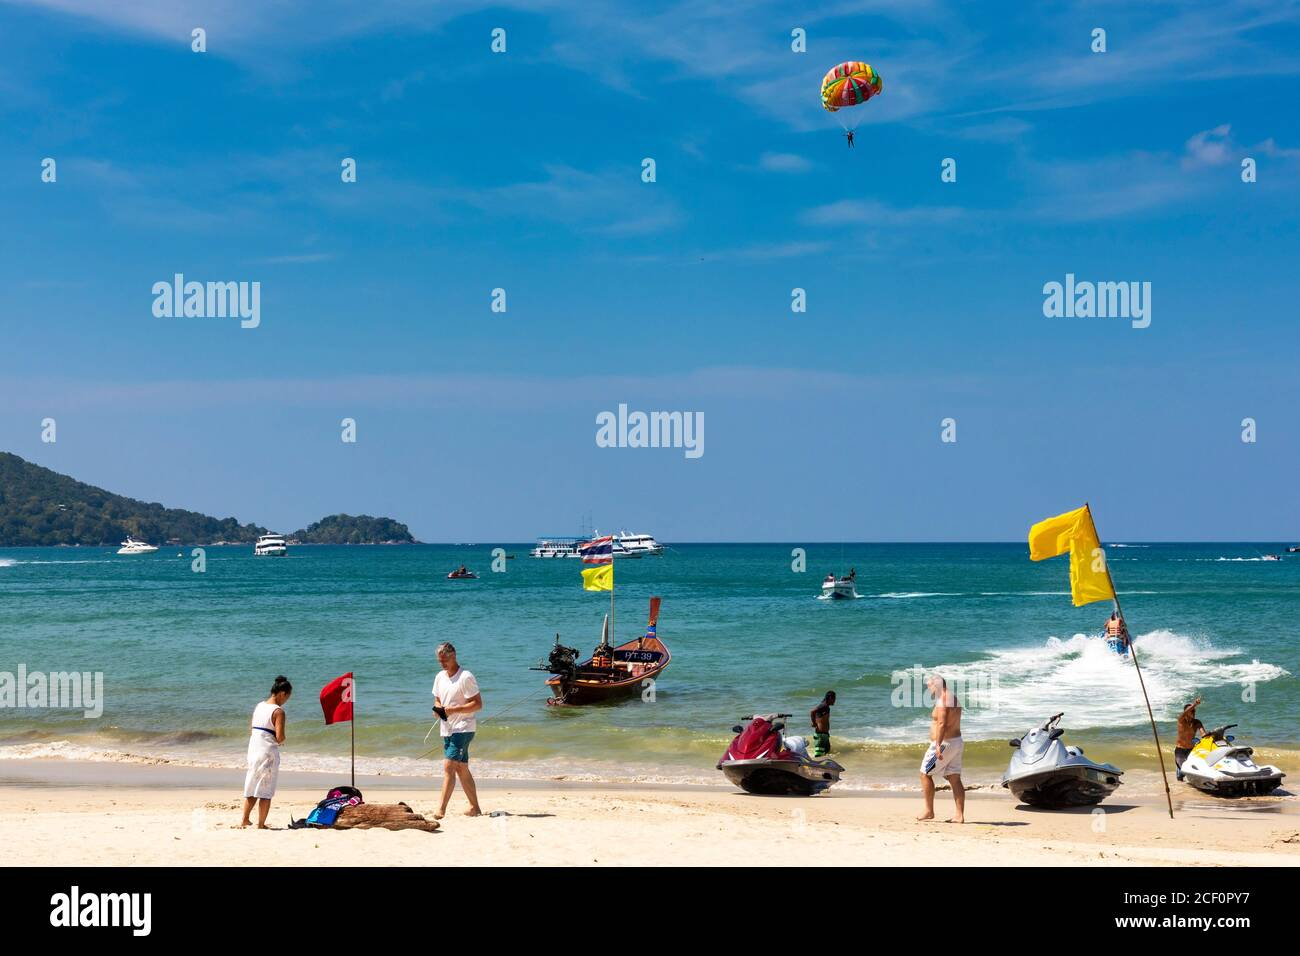 Parasailing sopra il mare, Patong Beach, Phuket, Thailandia Foto Stock